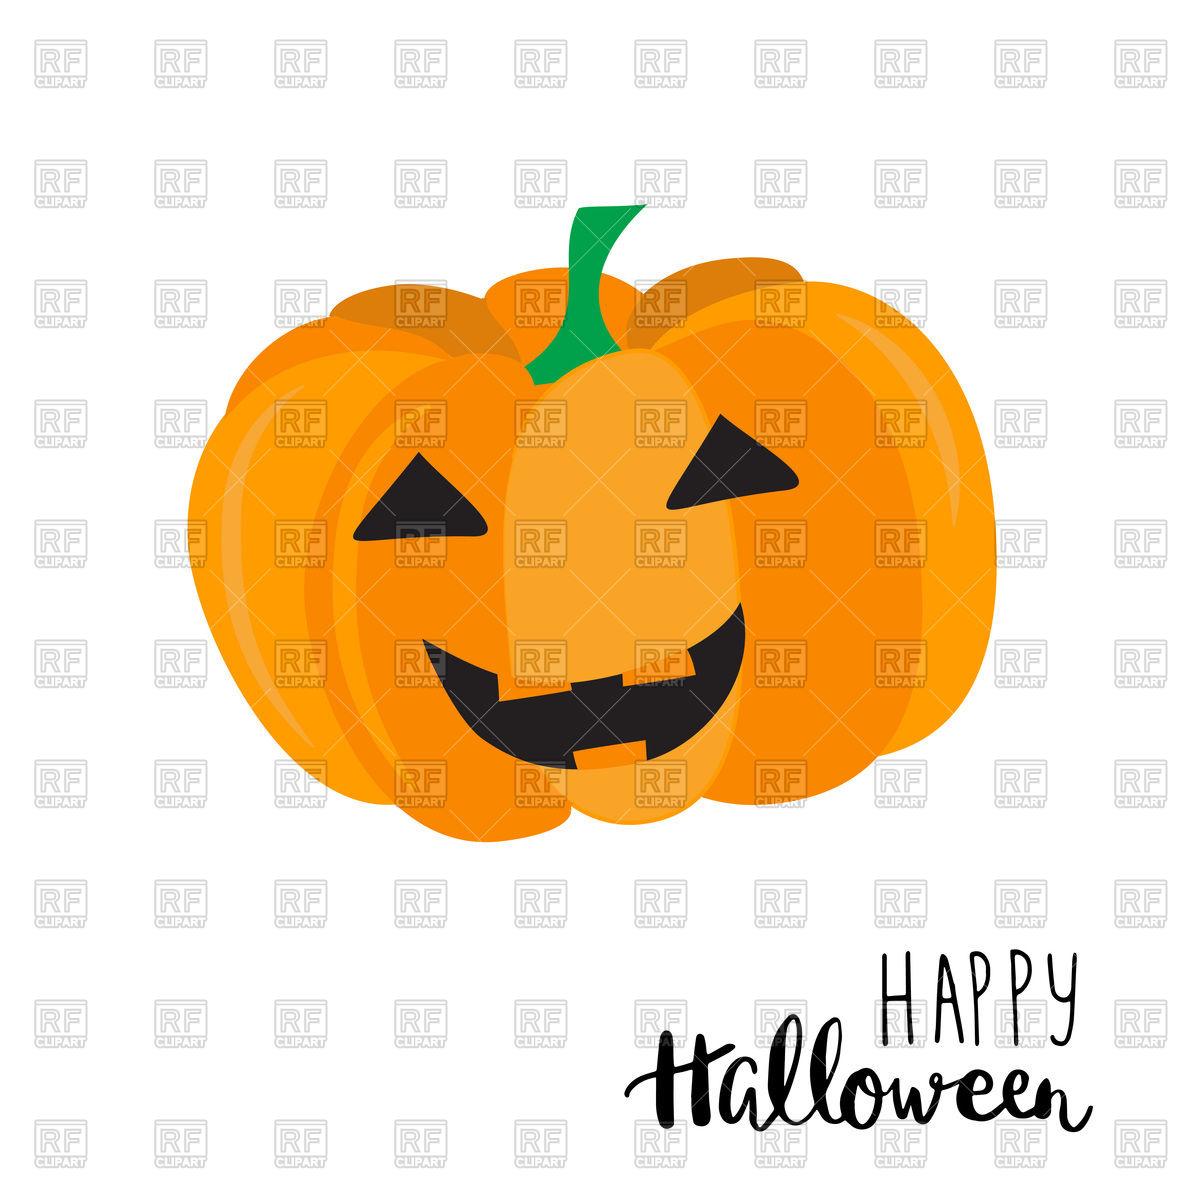 Happy Halloween сard with cute smiling pumpkin Vector Image.